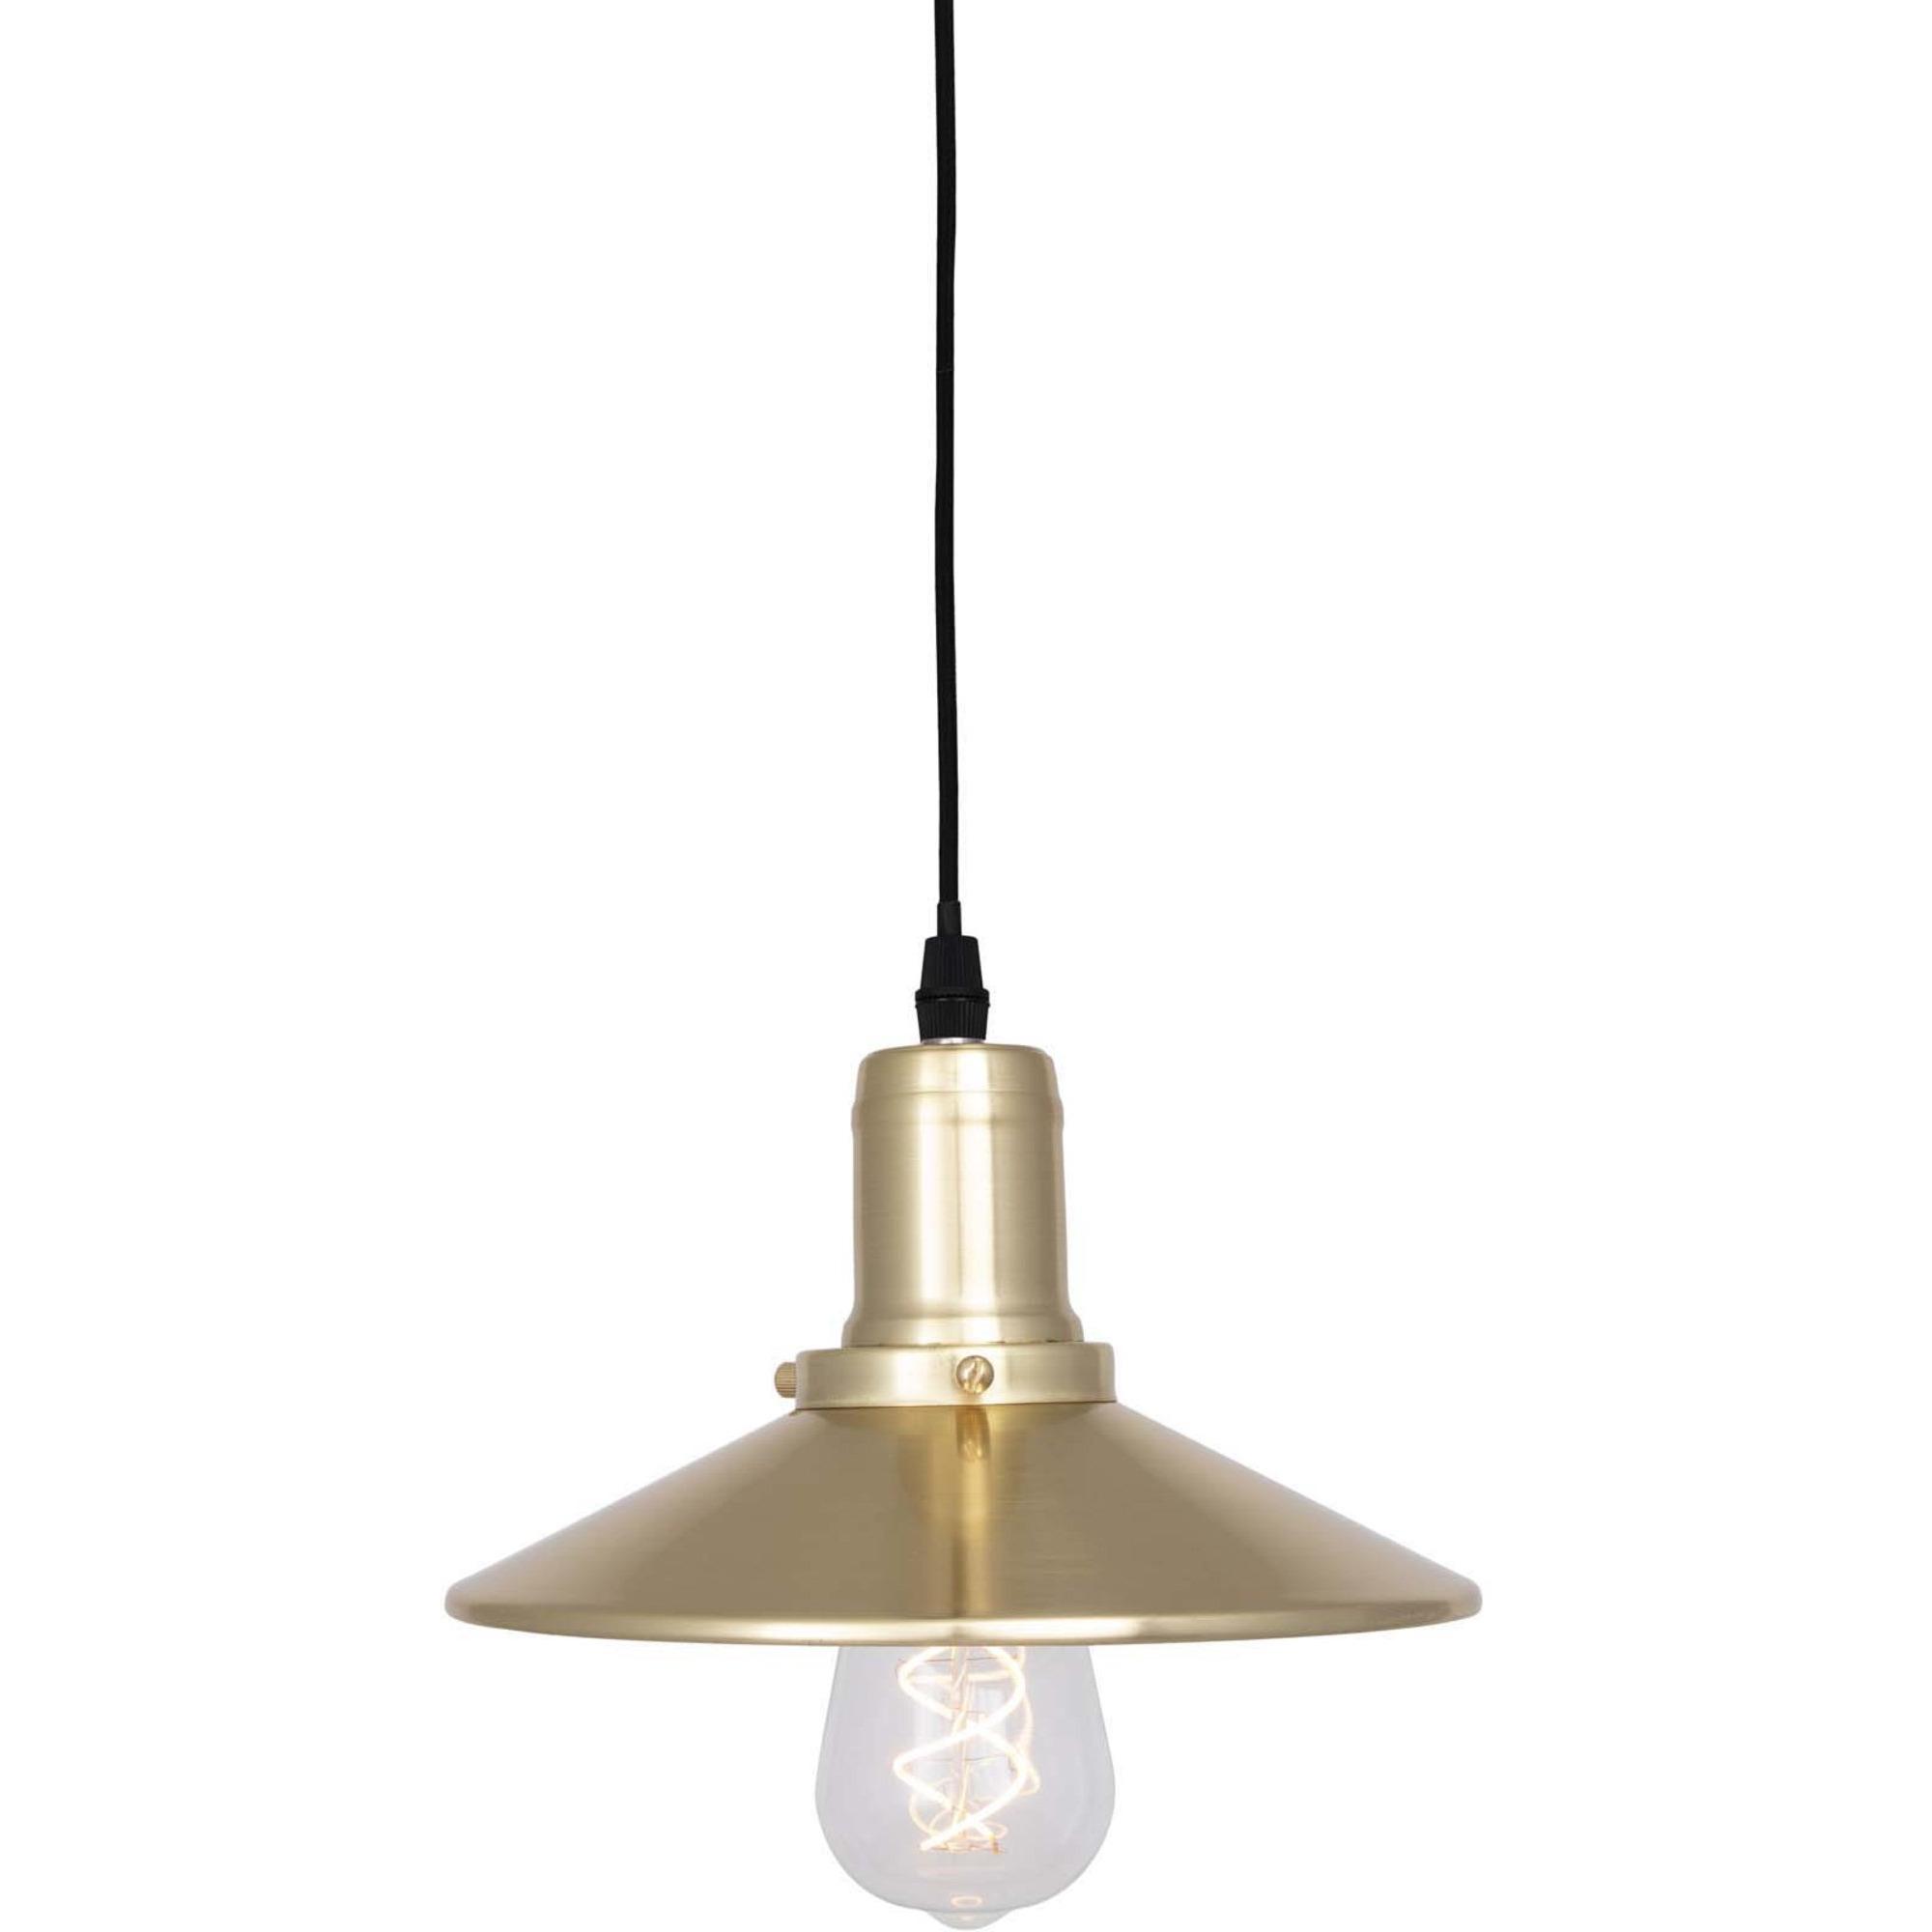 Globen Lighting Pendel Disc Mini Borstad Mässing